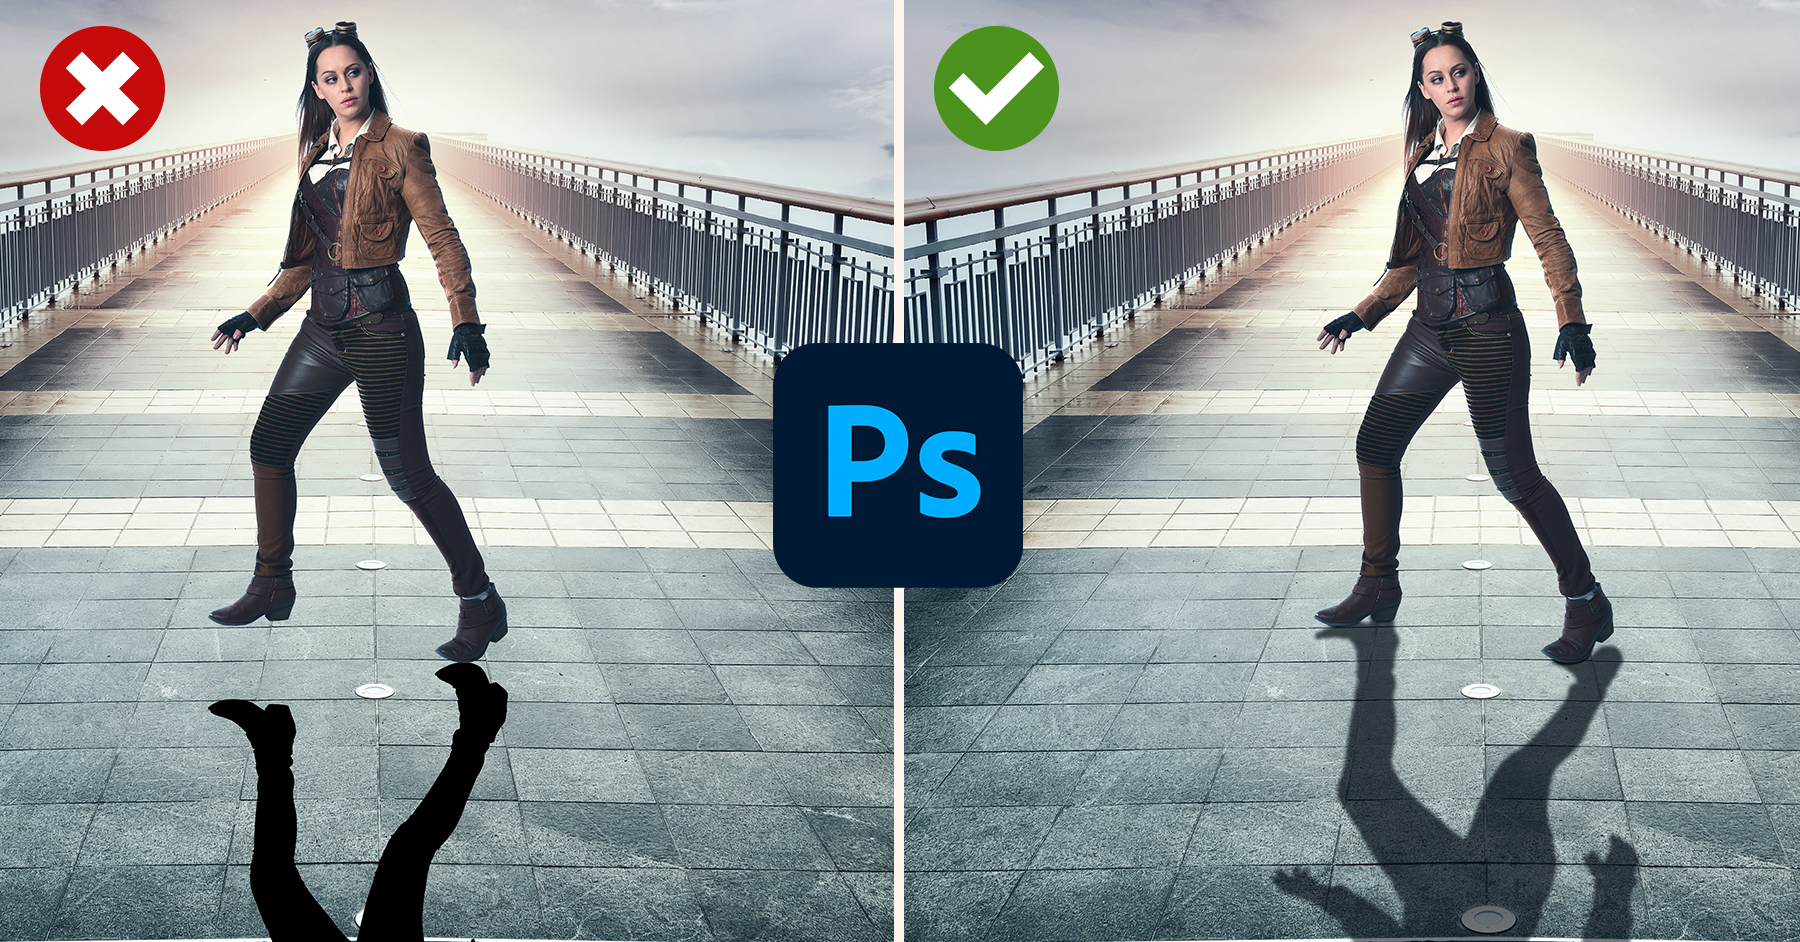 Shadows Photoshop